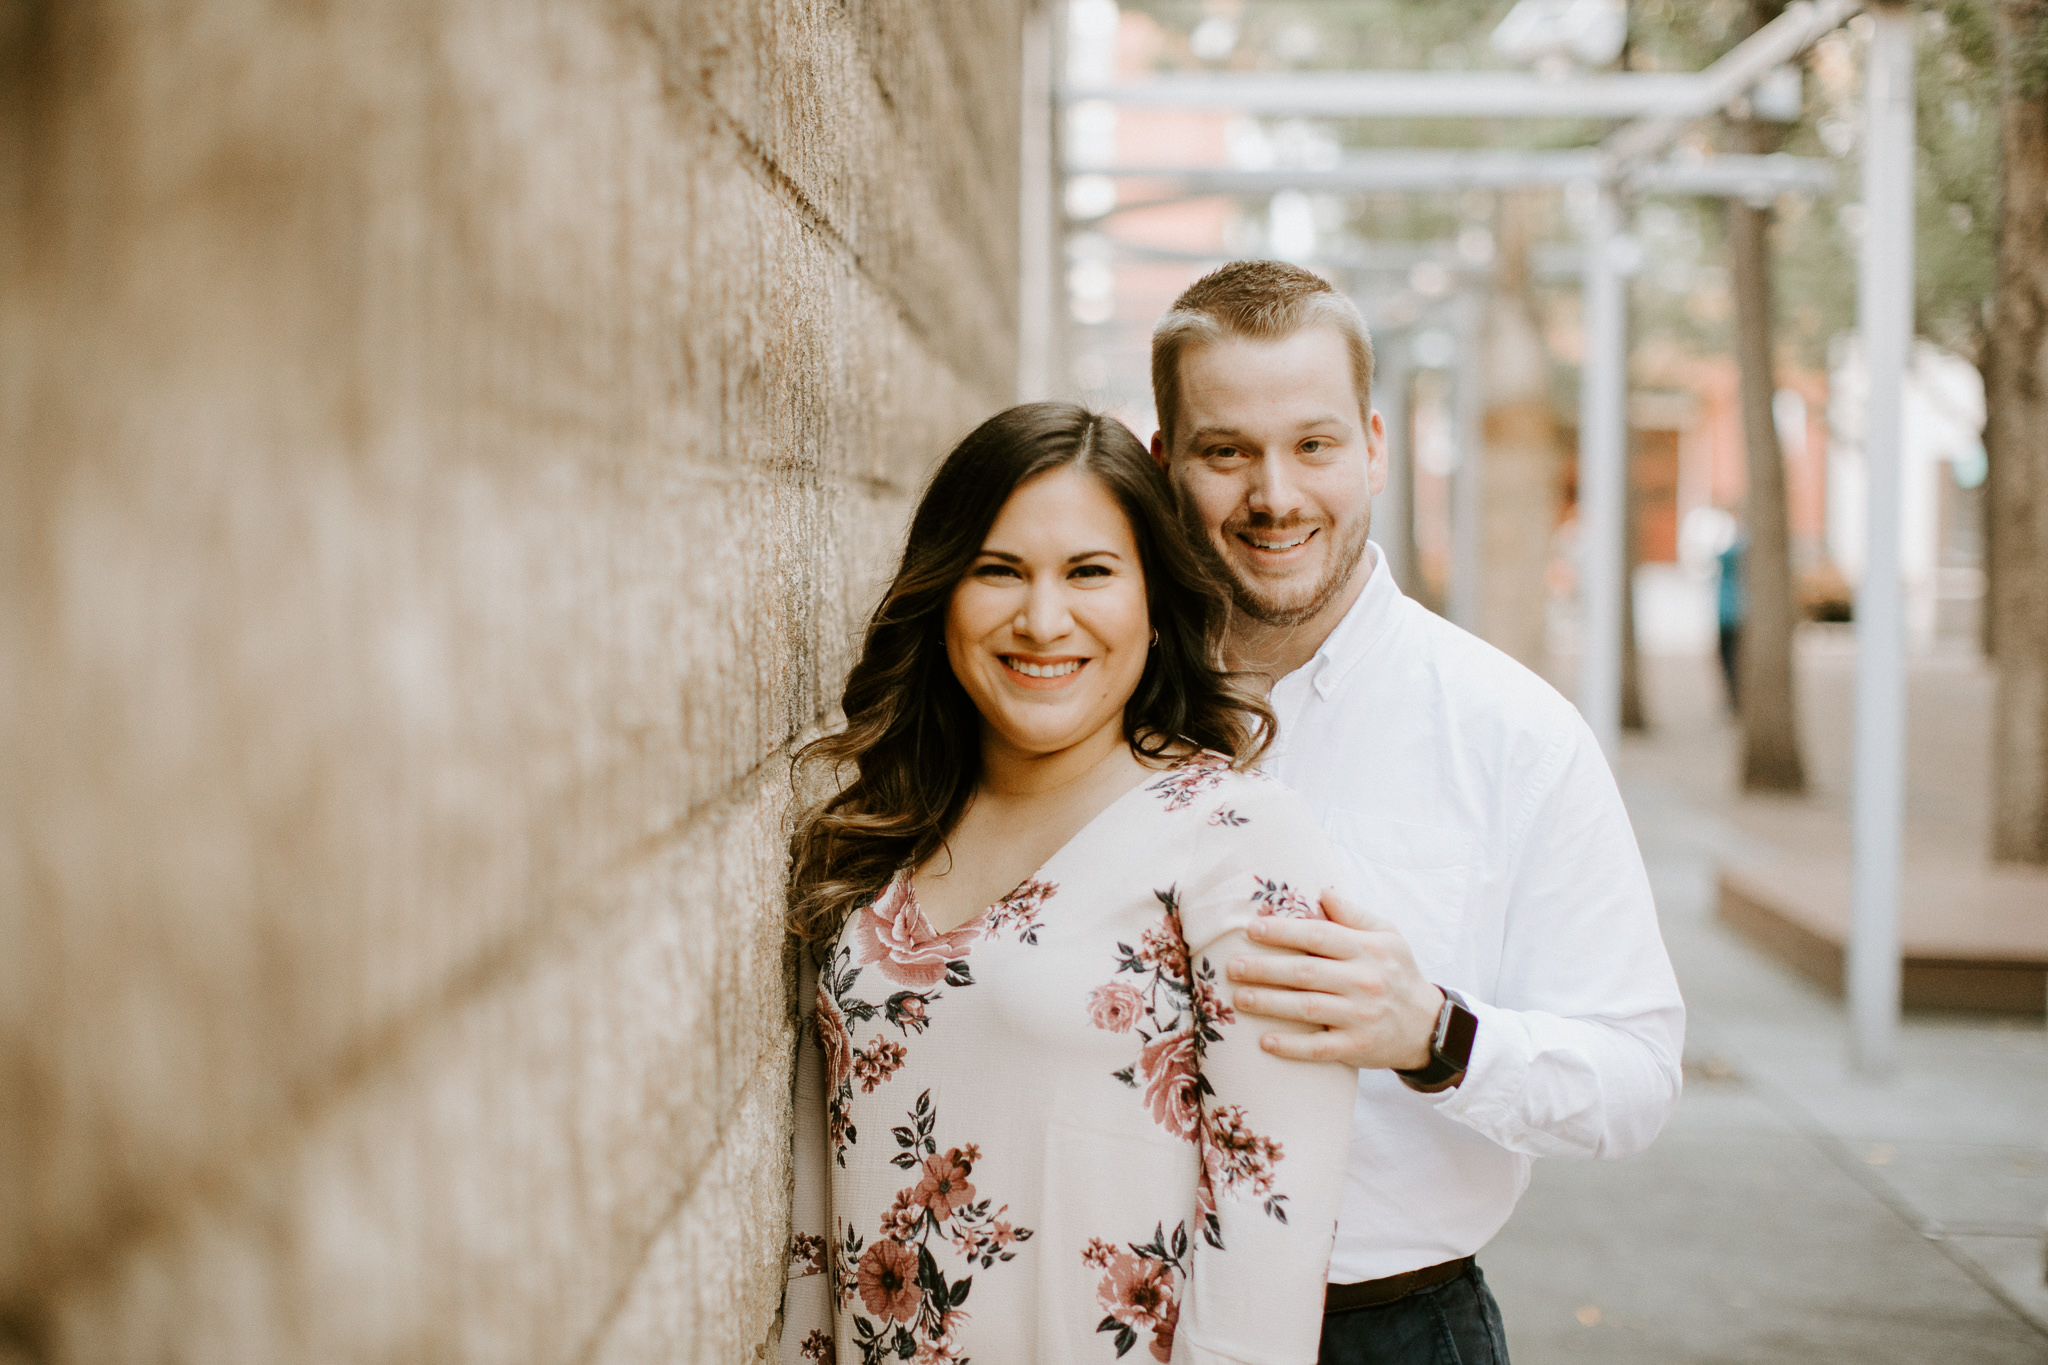 Engagement - Downtown Roanoke -  Wedding Photographer - Virginia - Best - Pat Cori Photography-9.jpg